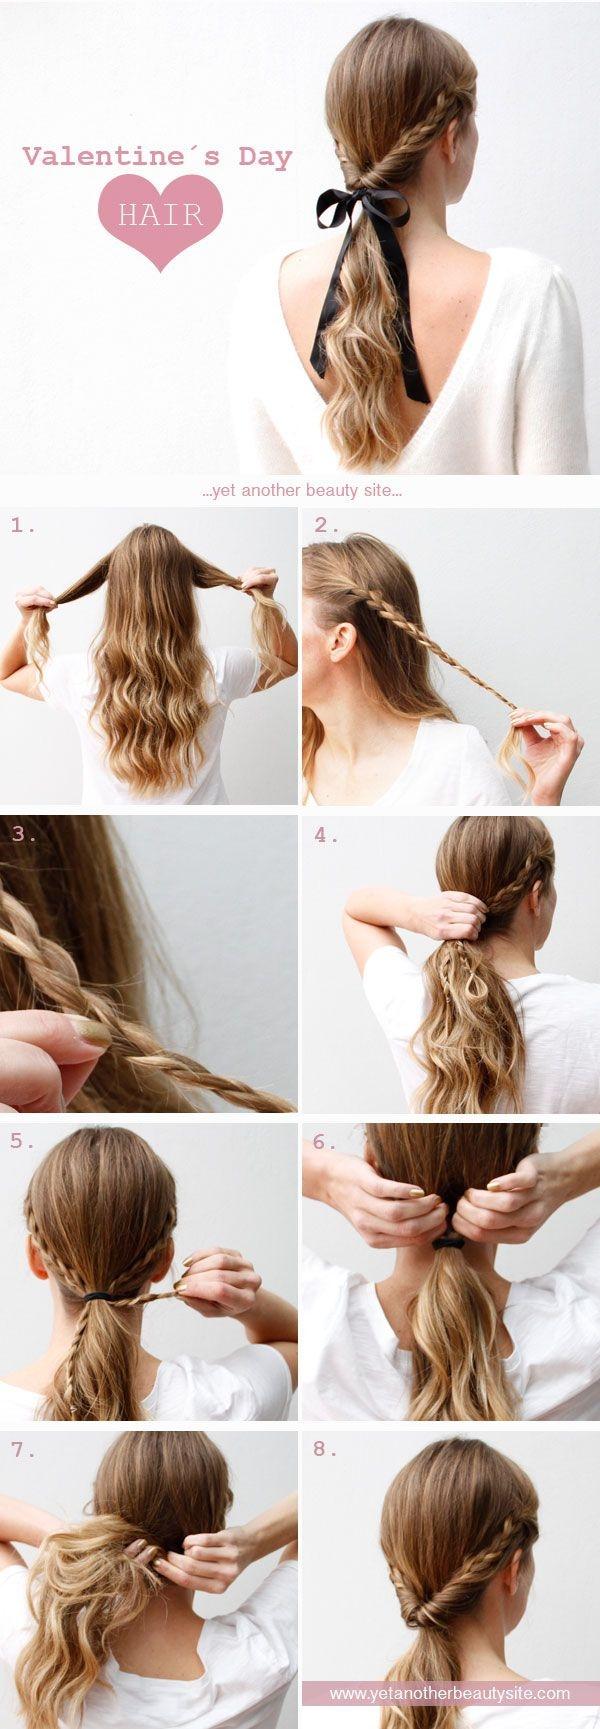 Easy Valentine's Hair